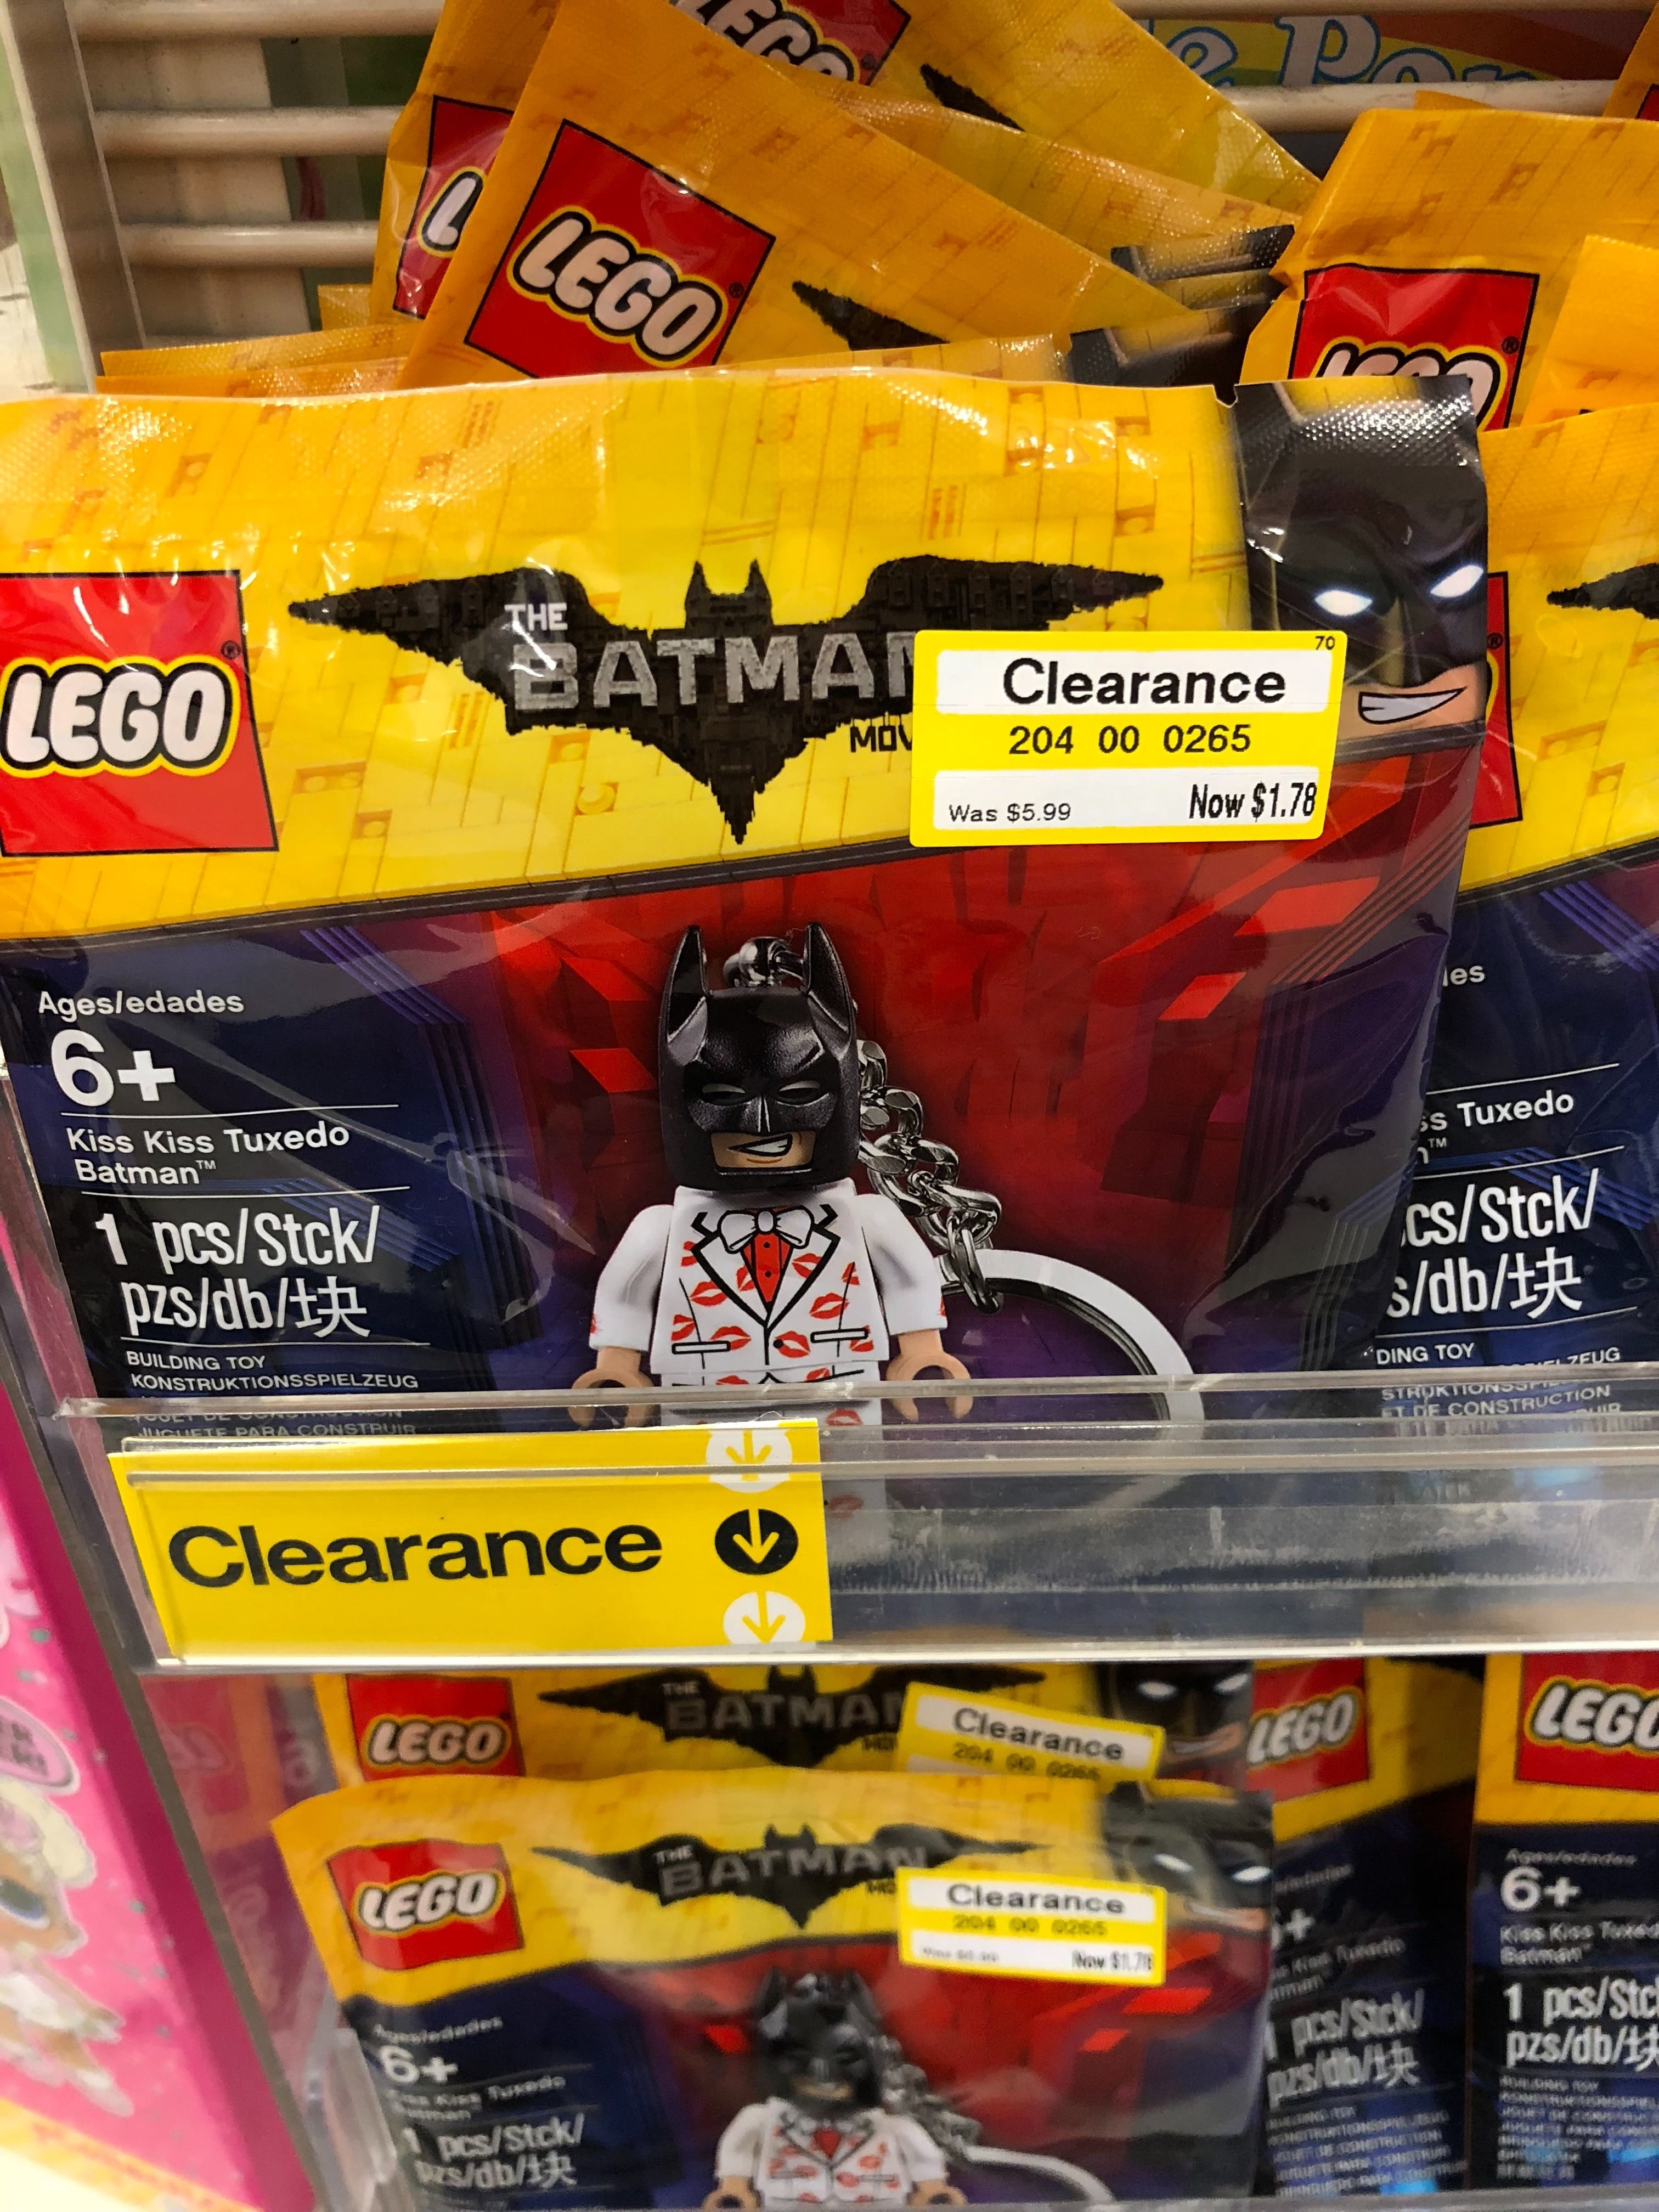 LEGO BATMAN MOVIE Kiss Kiss Tuxedo Key Chain clearance $1.78 in Target B&M (YMMV)